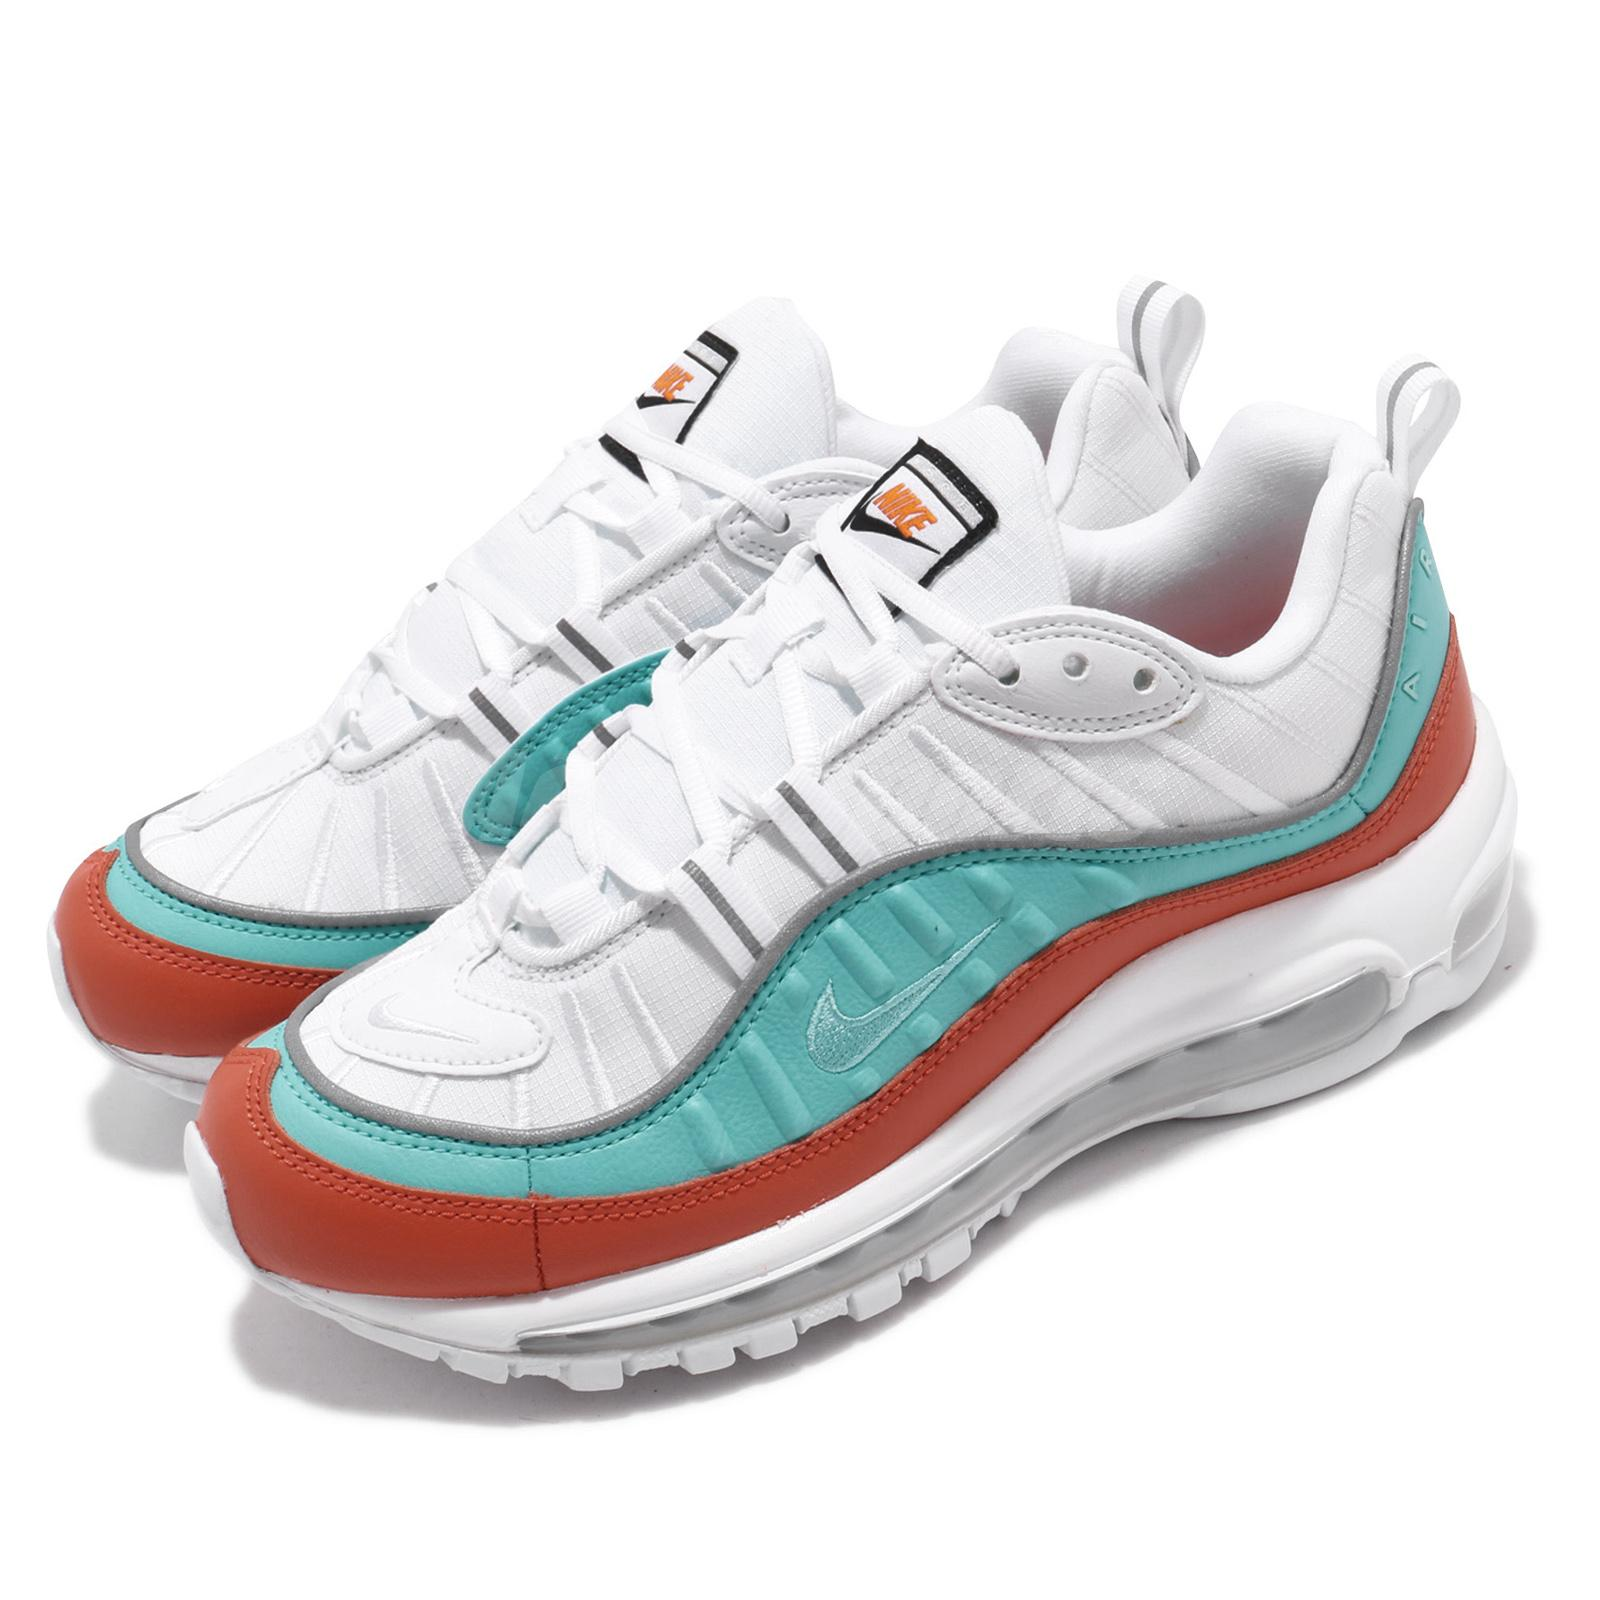 Nike Wmns Air Max 98 Se Cosmic Clay Light Aqua White Women Shoes